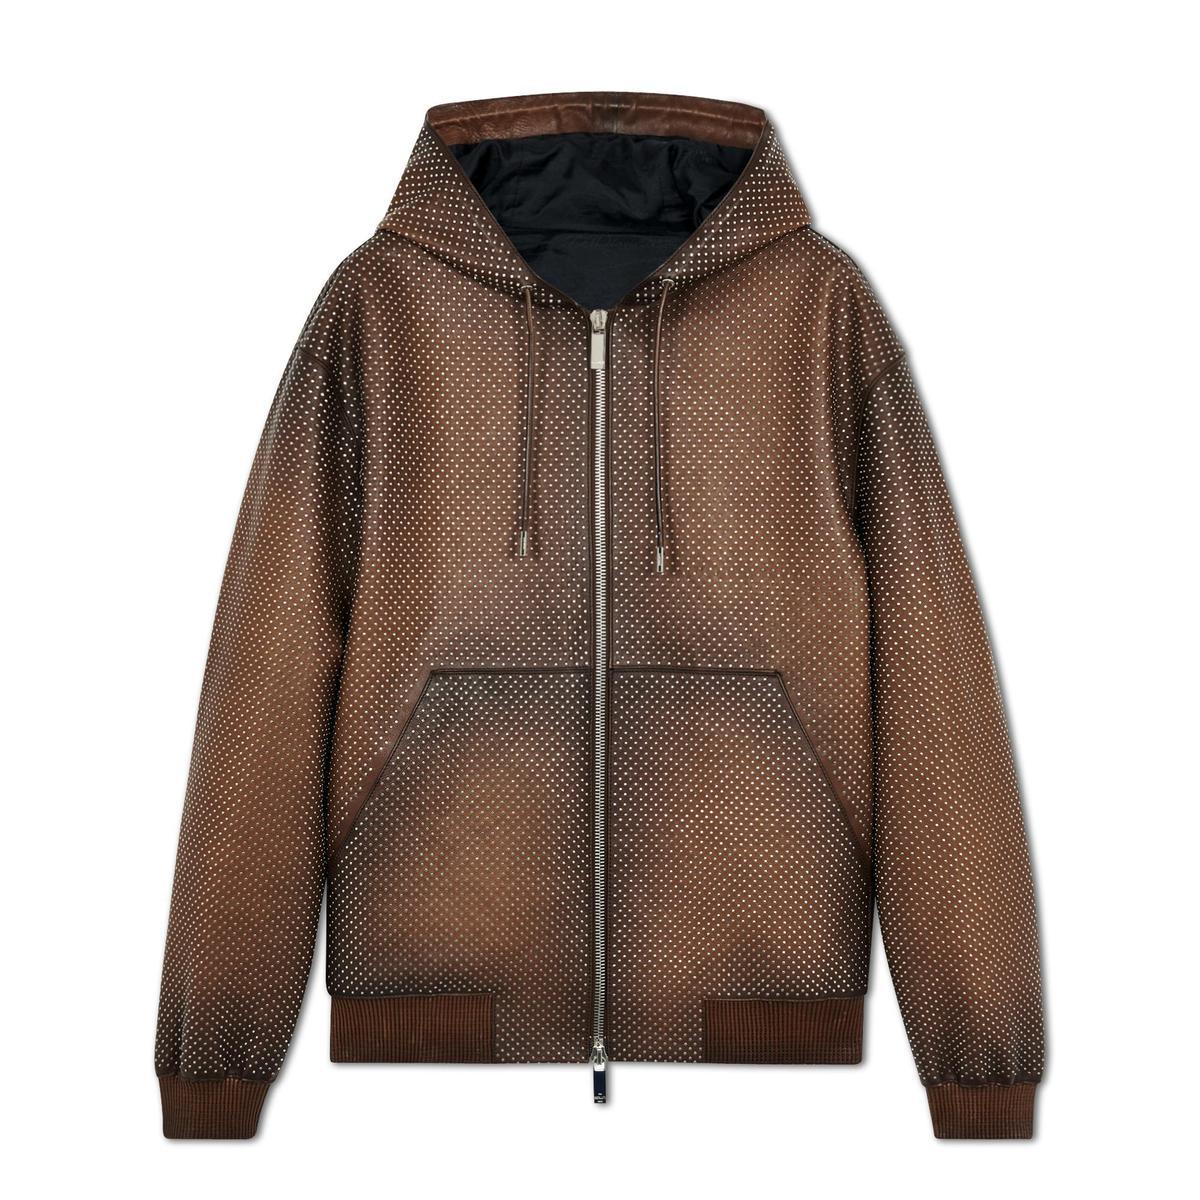 Patina皮革連帽外套。NT$340,000(Berluti提供)